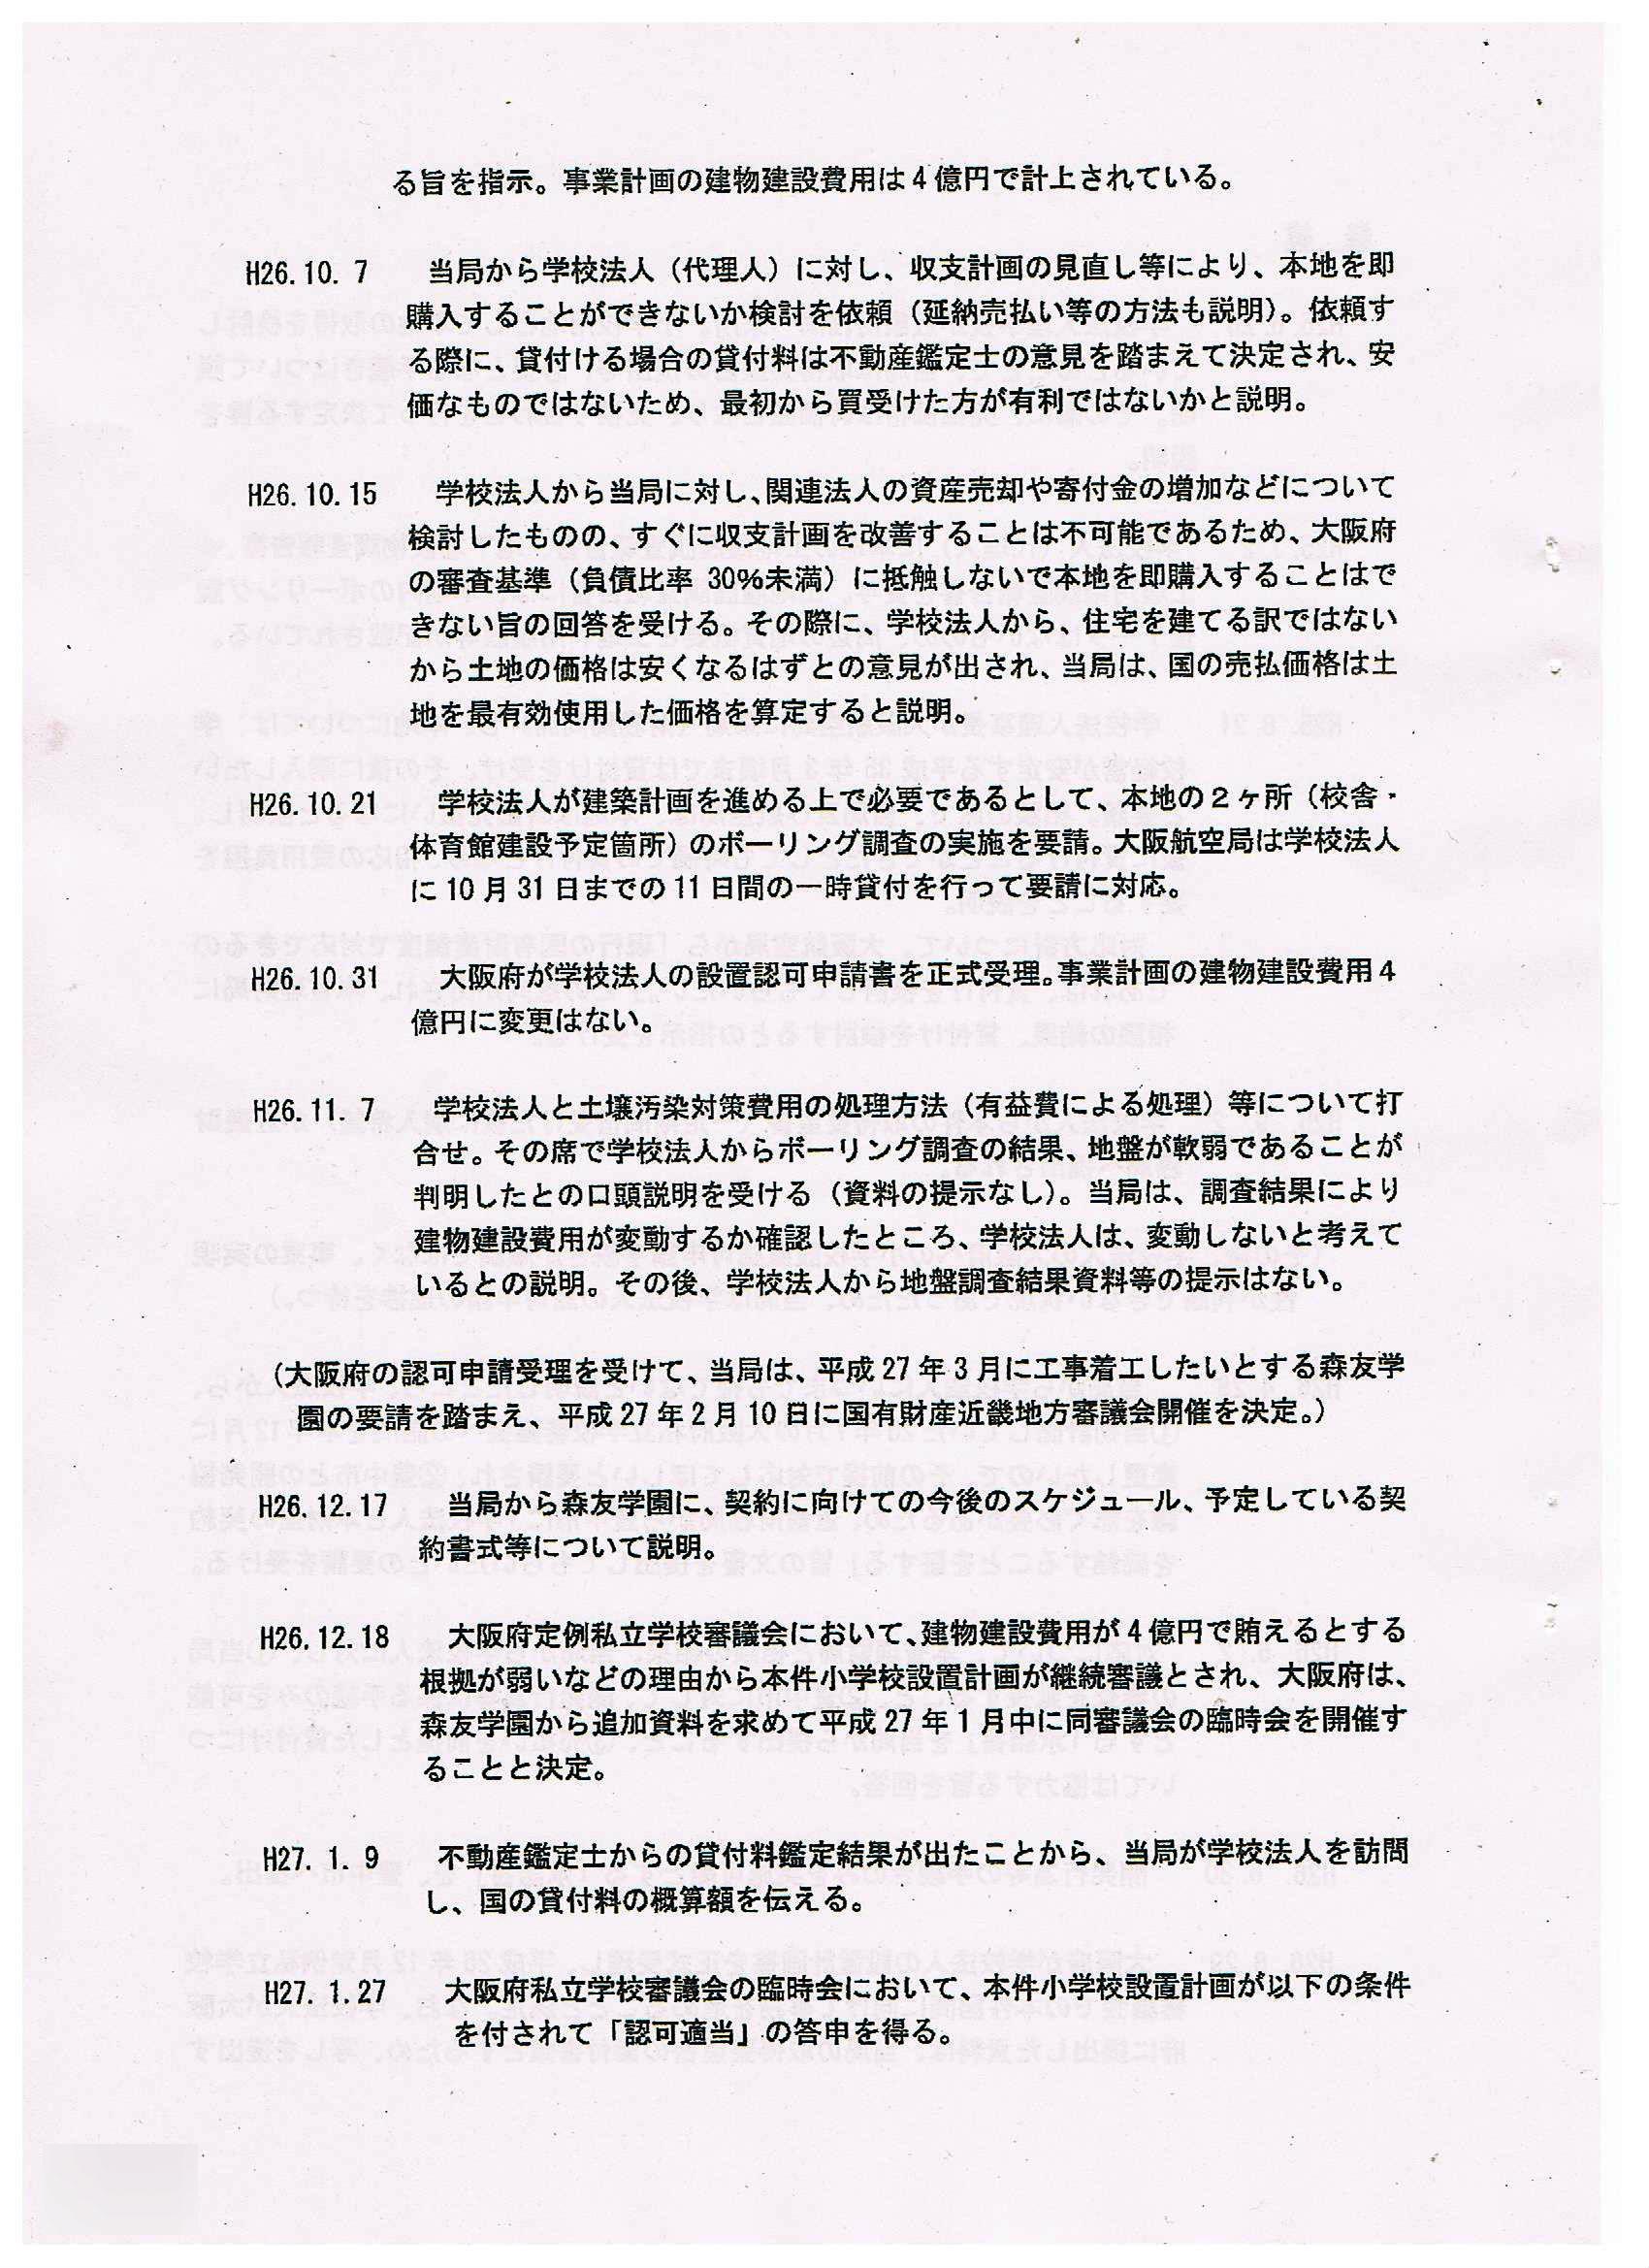 http://hunter-investigate.jp/news/aade029310b41db2652845626a31b2ba17ad7d16.jpg